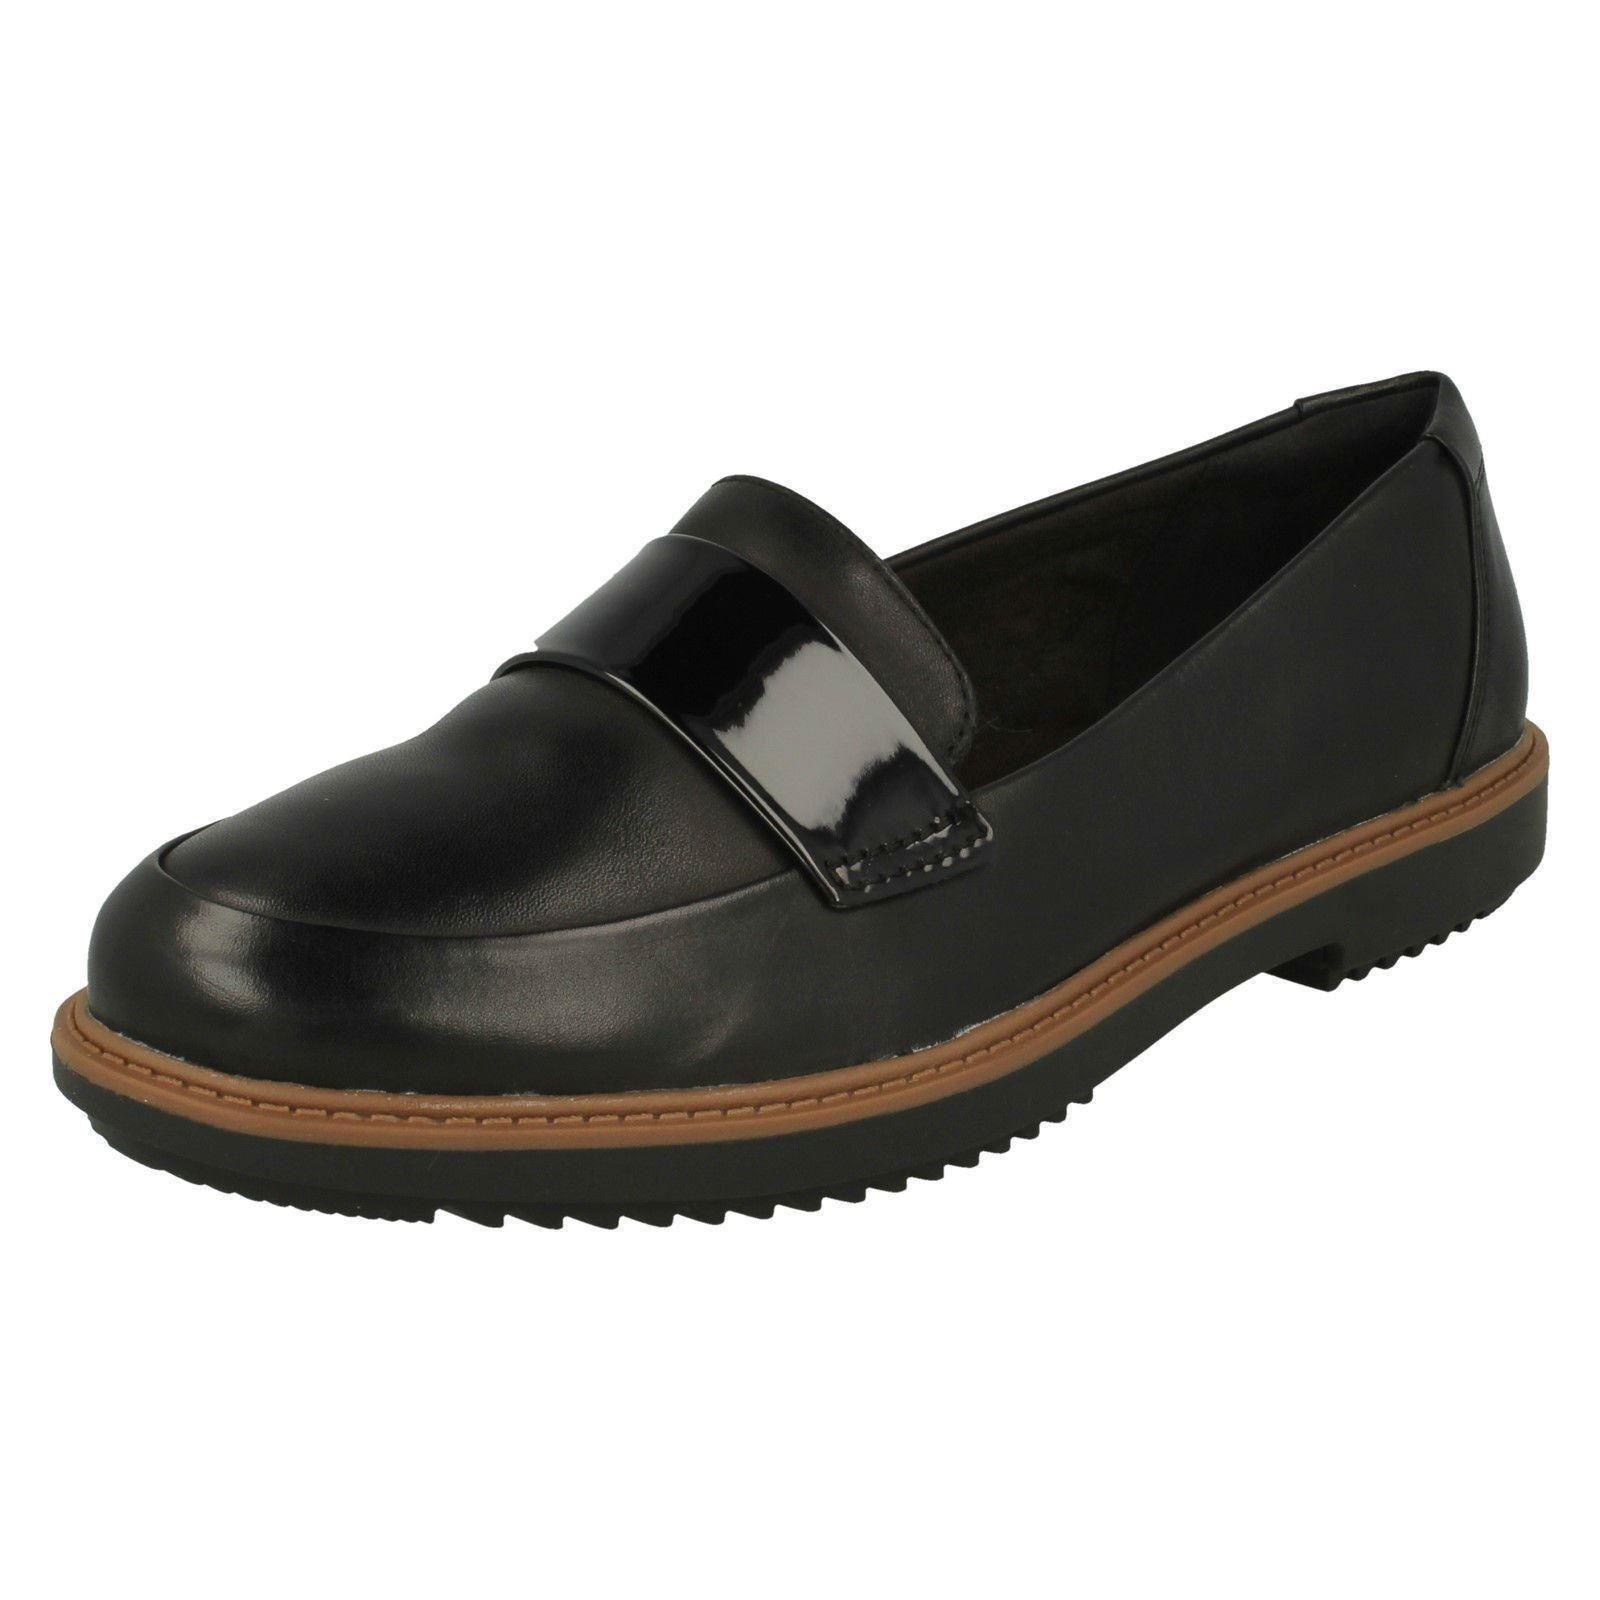 Signore  Clarks Raisie Arlie nero Leather Slip On scarpe  grande sconto